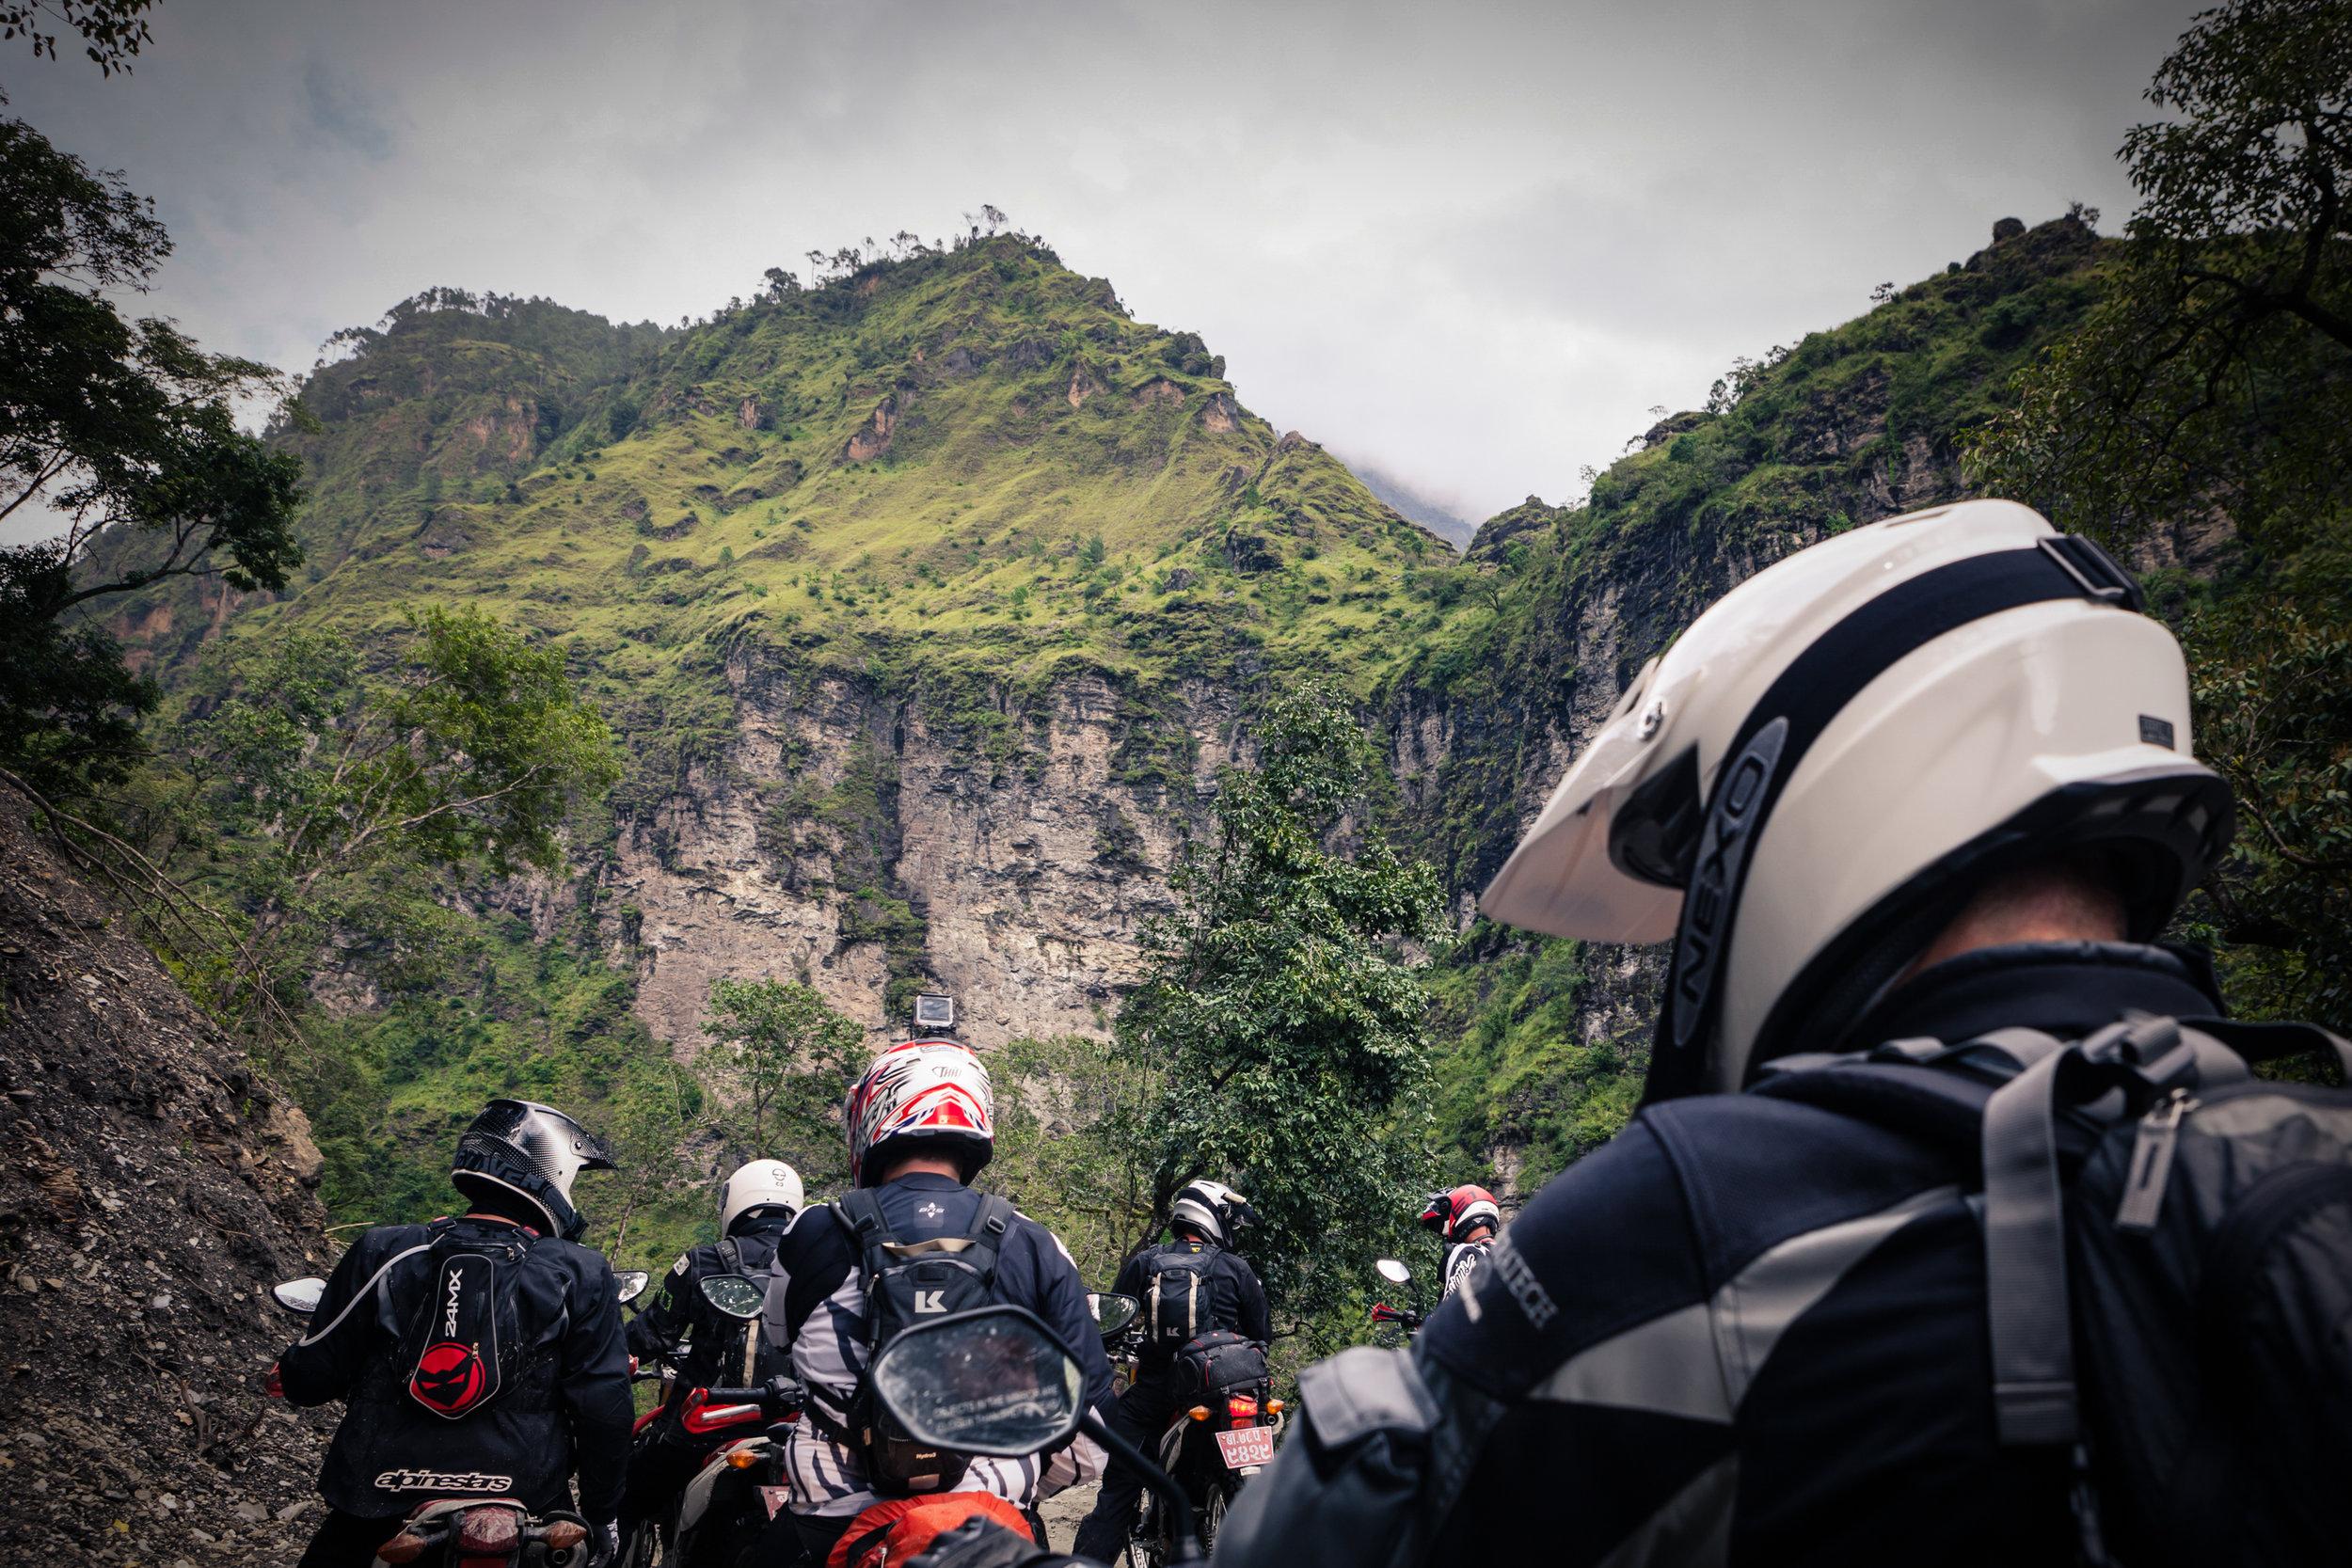 TWHMC-nepal-motorcycle-adventure-2016-0564-3.jpg